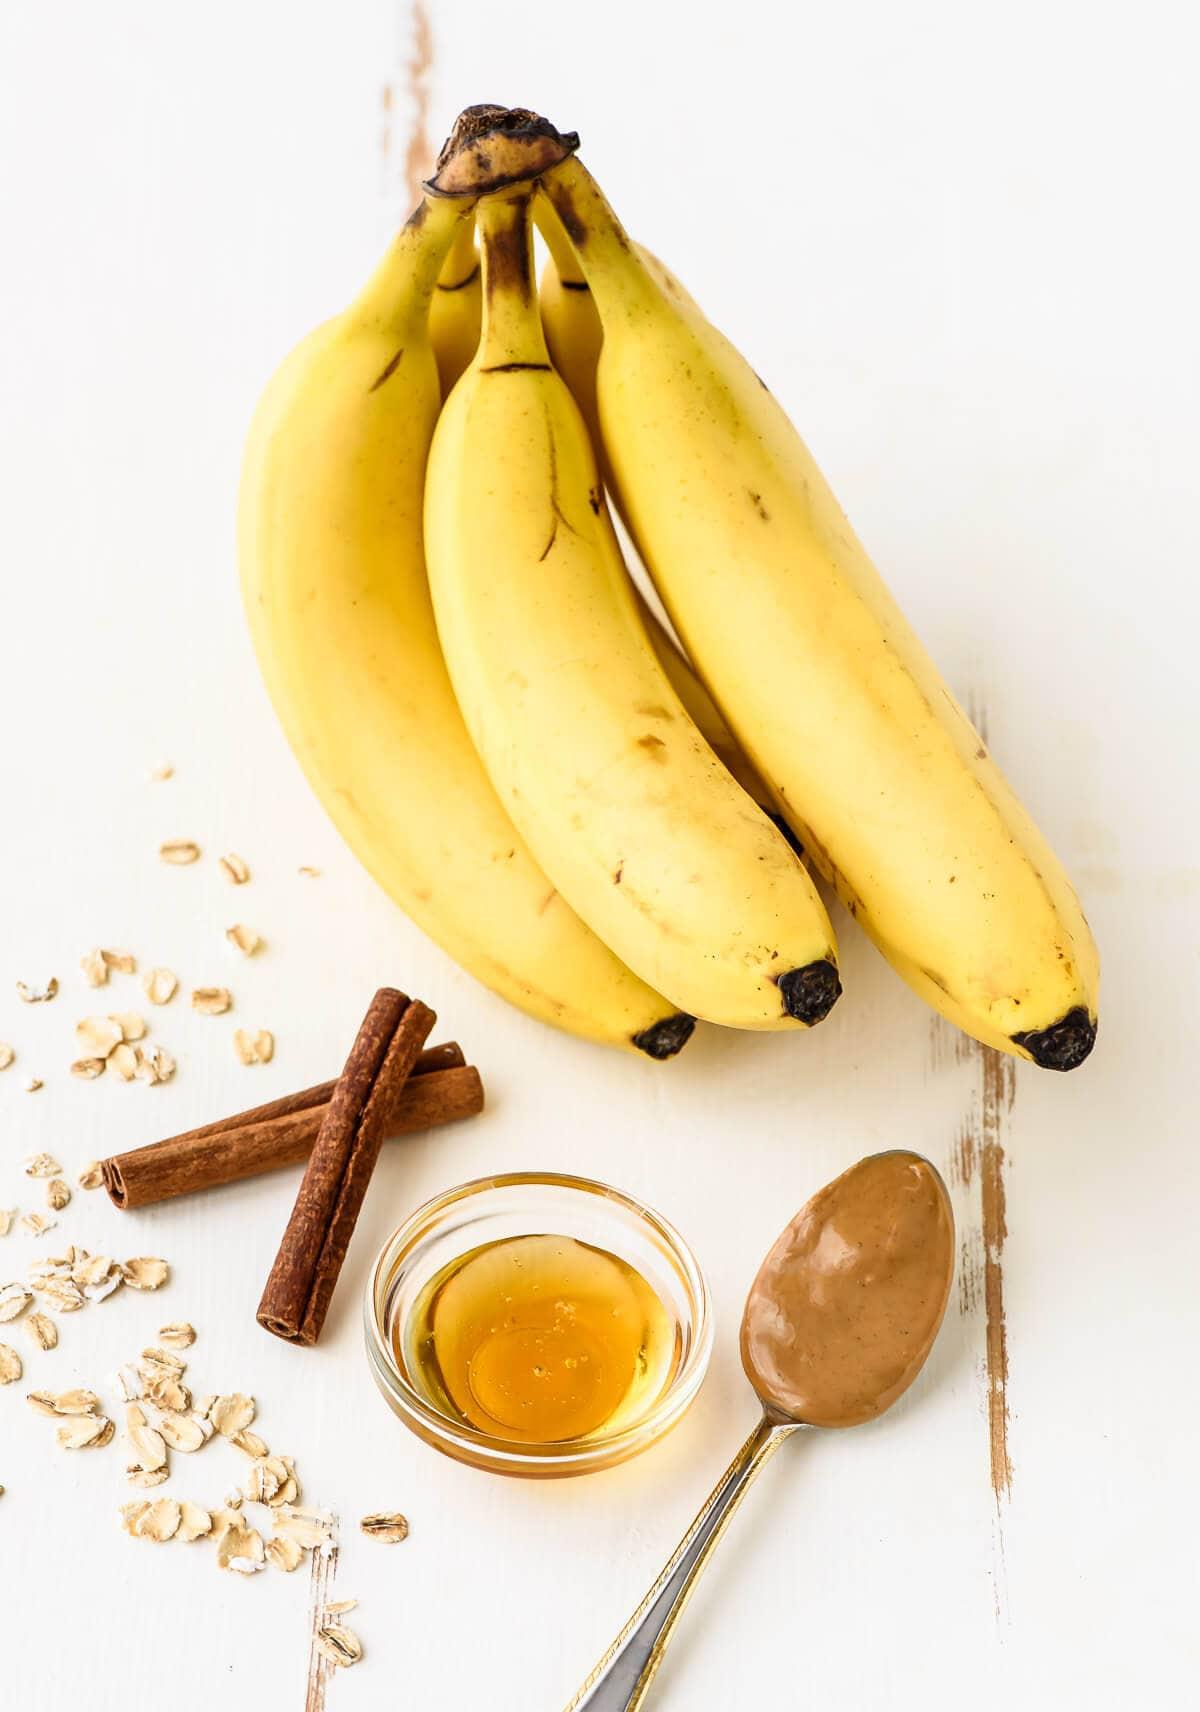 Oatmeal Breakfast Bars with Peanut Butter Banana and Honey